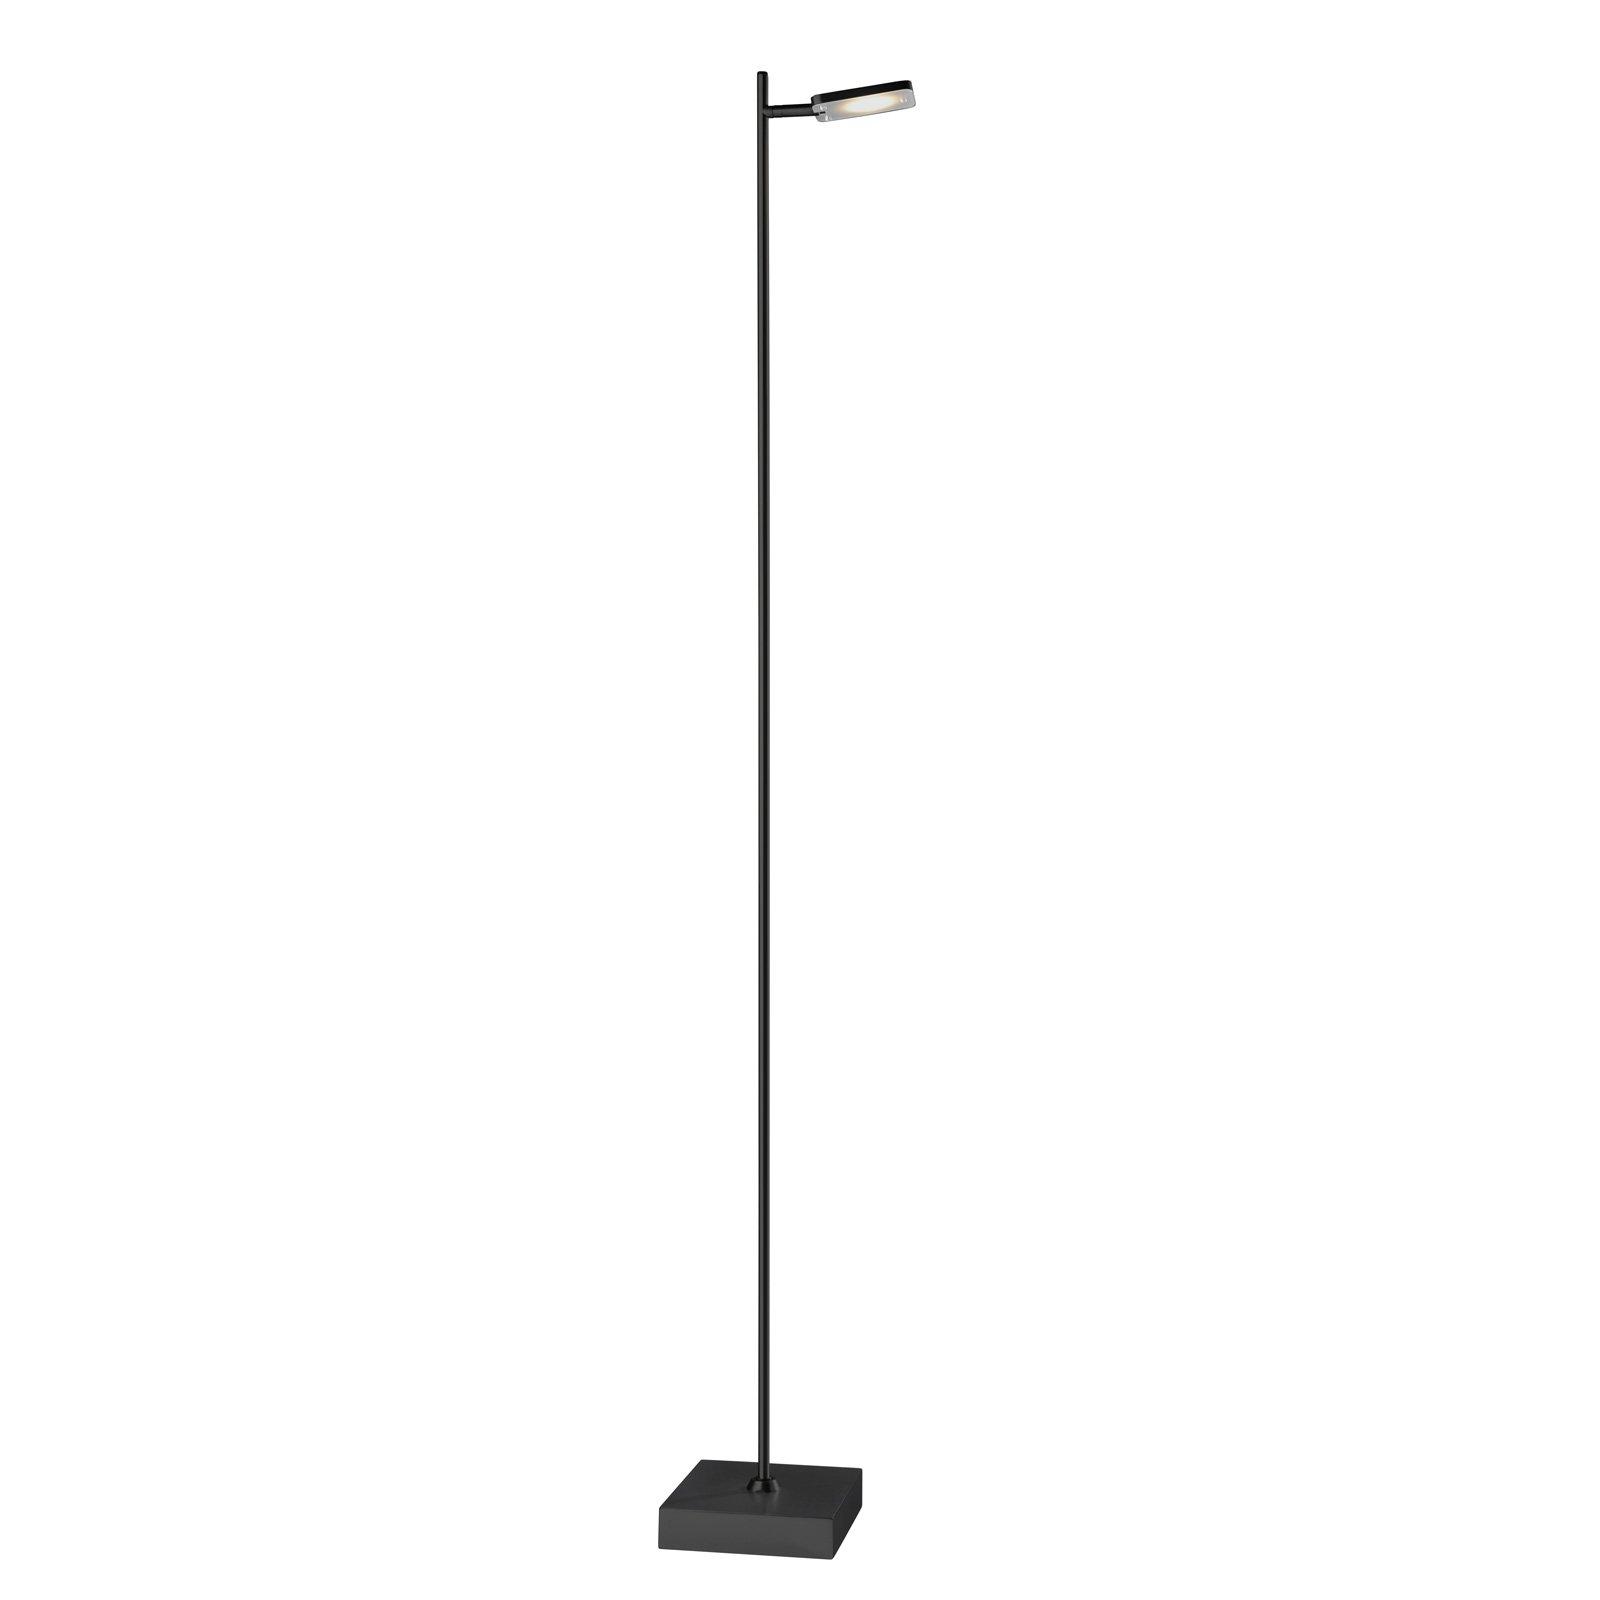 LED-gulvlampe Quad, dimmer, 1 lyskilde, svart